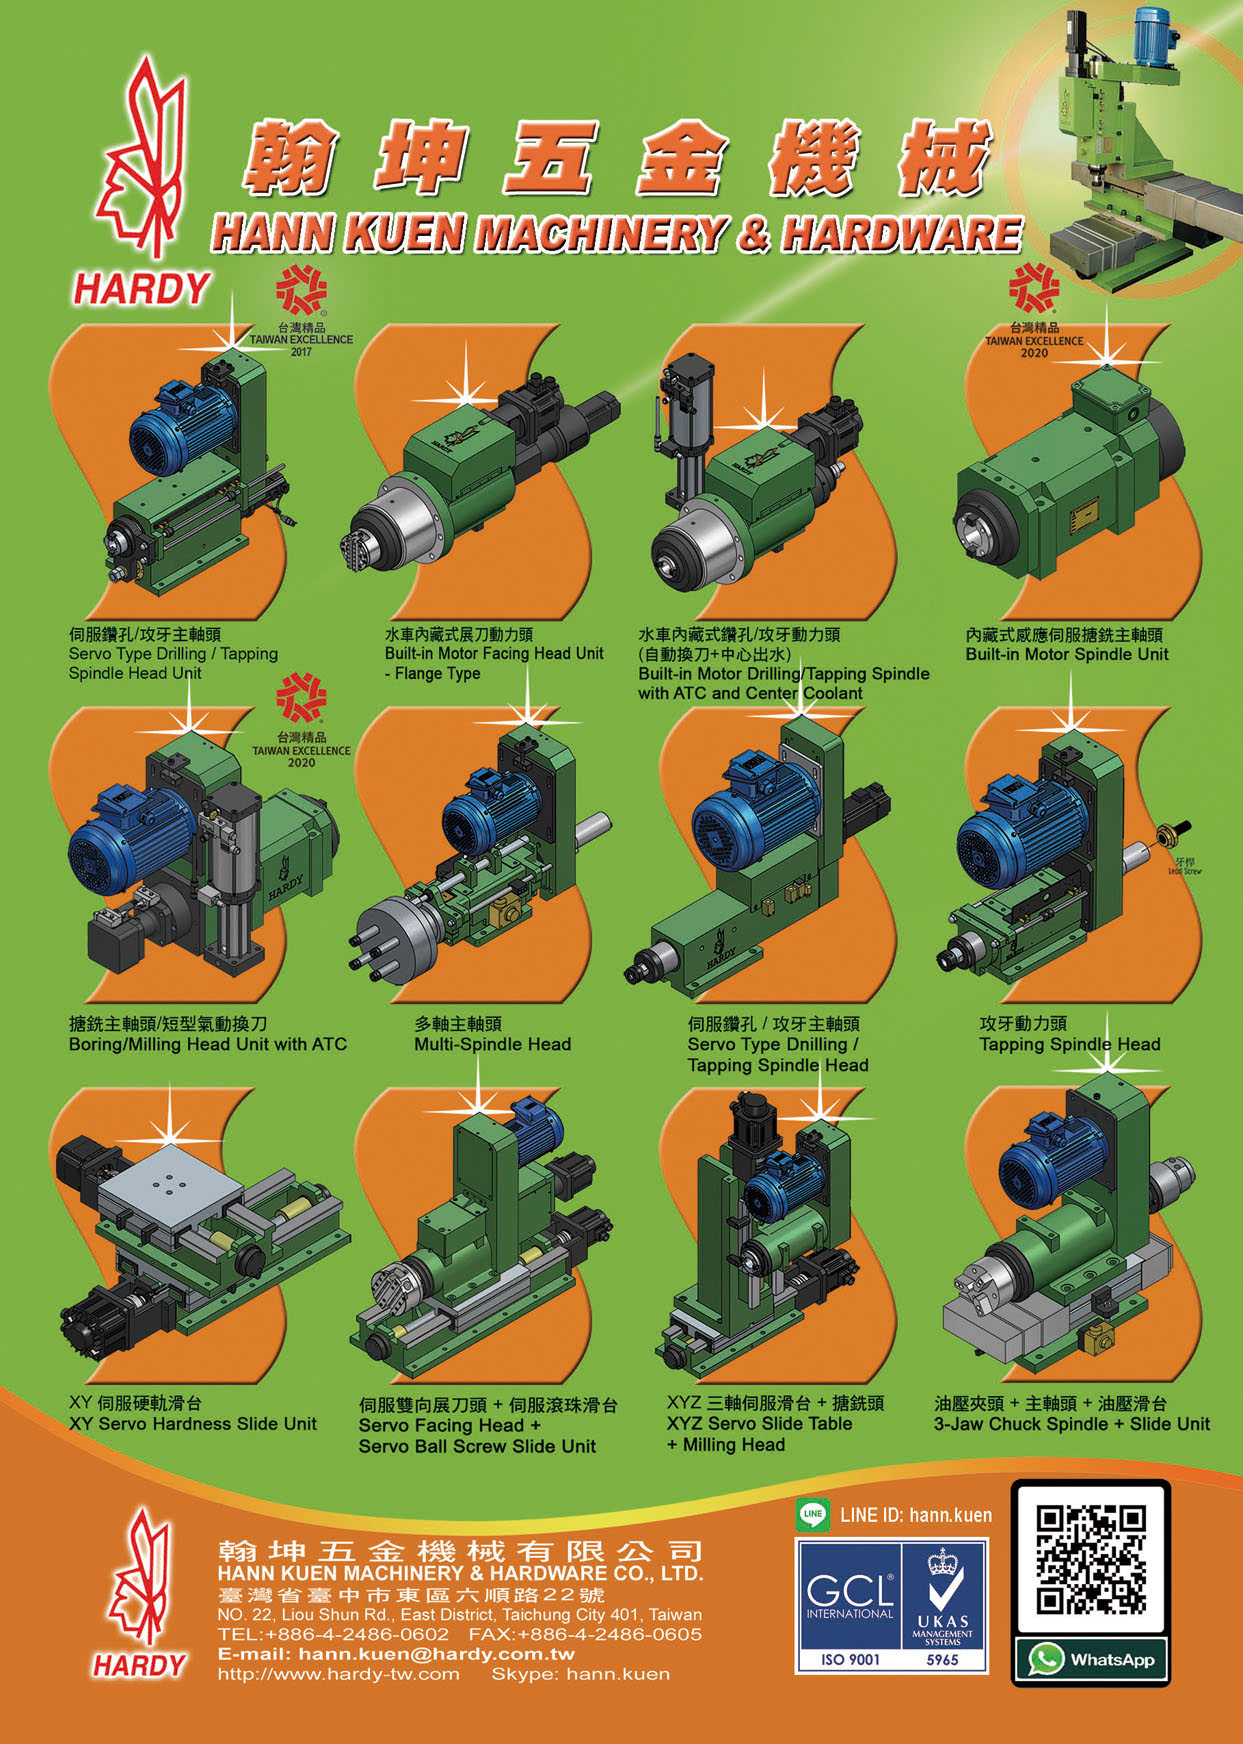 HANN KUEN MACHINERY & HARDWARE CO., LTD.